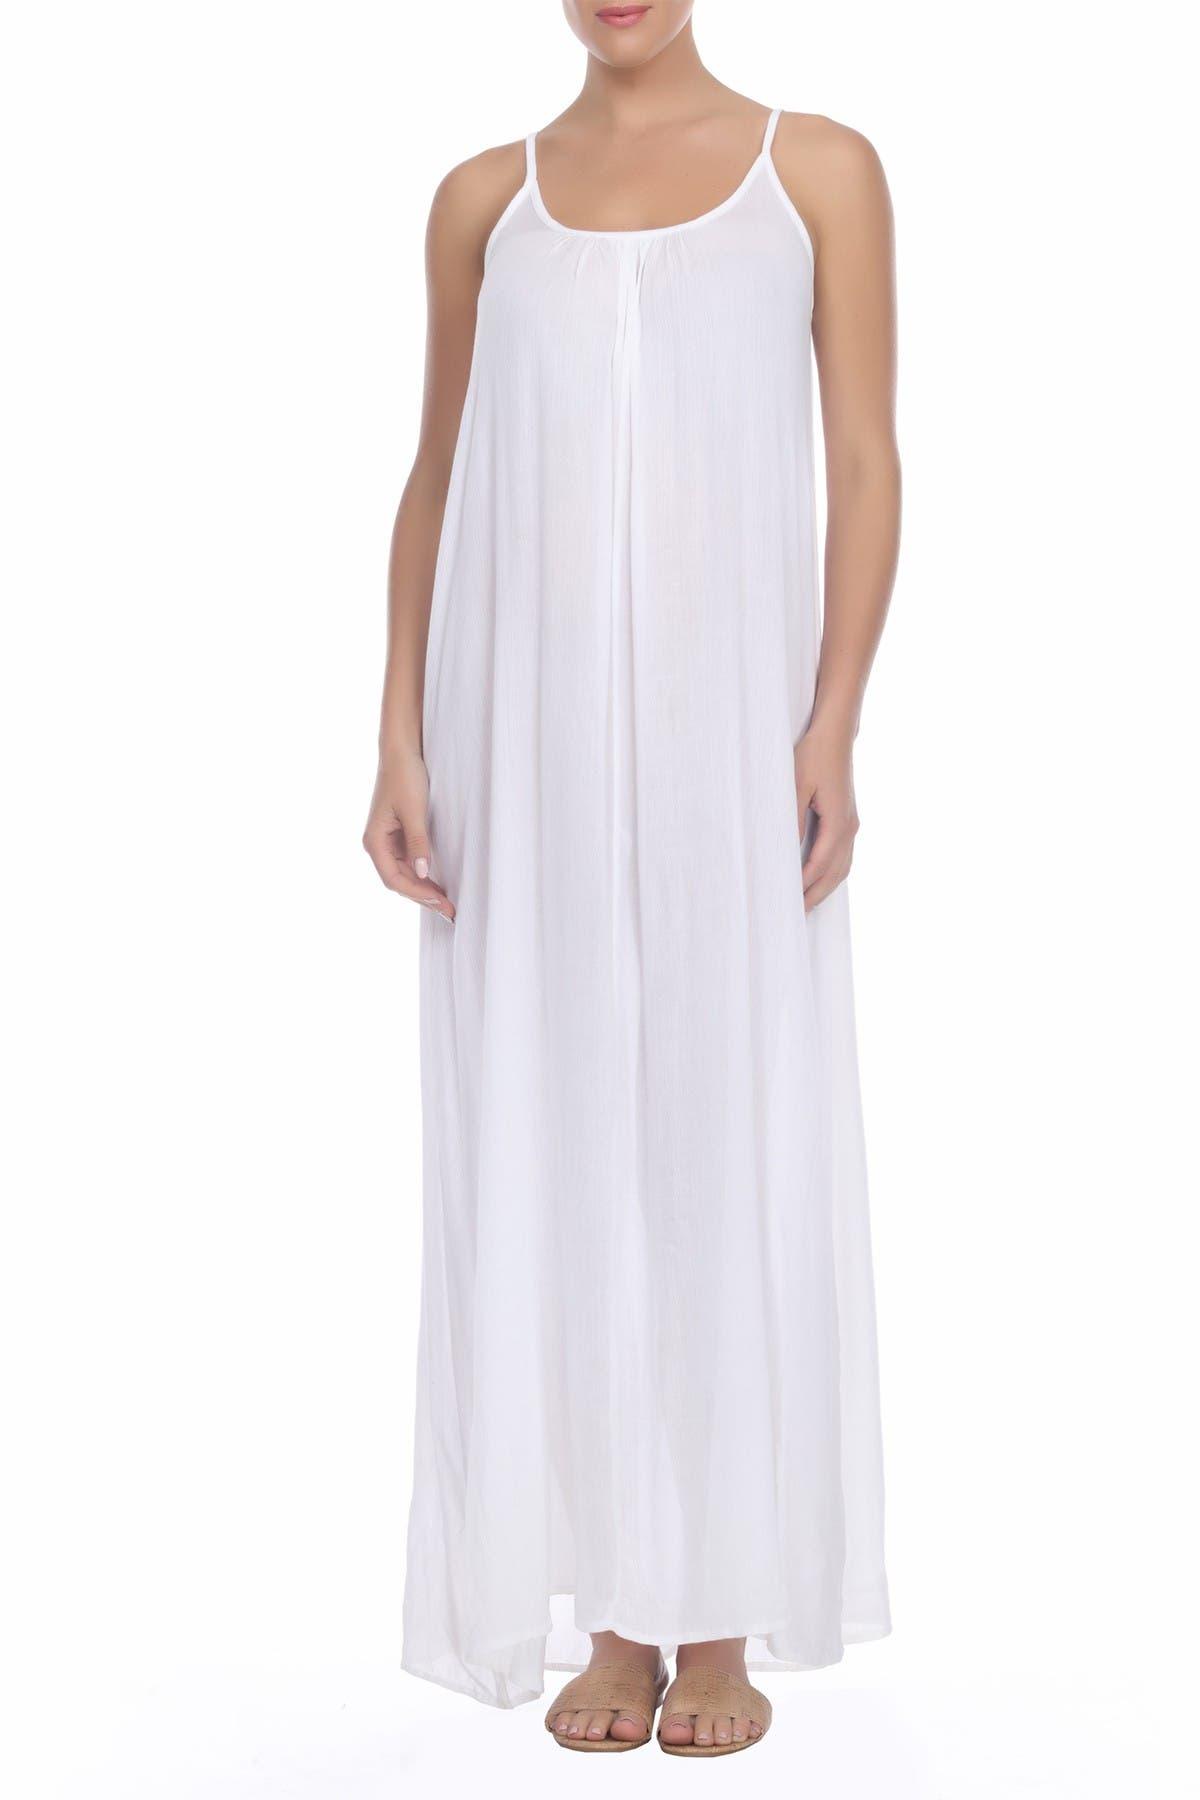 Image of BOHO ME Criss Cross Back Maxi Dress